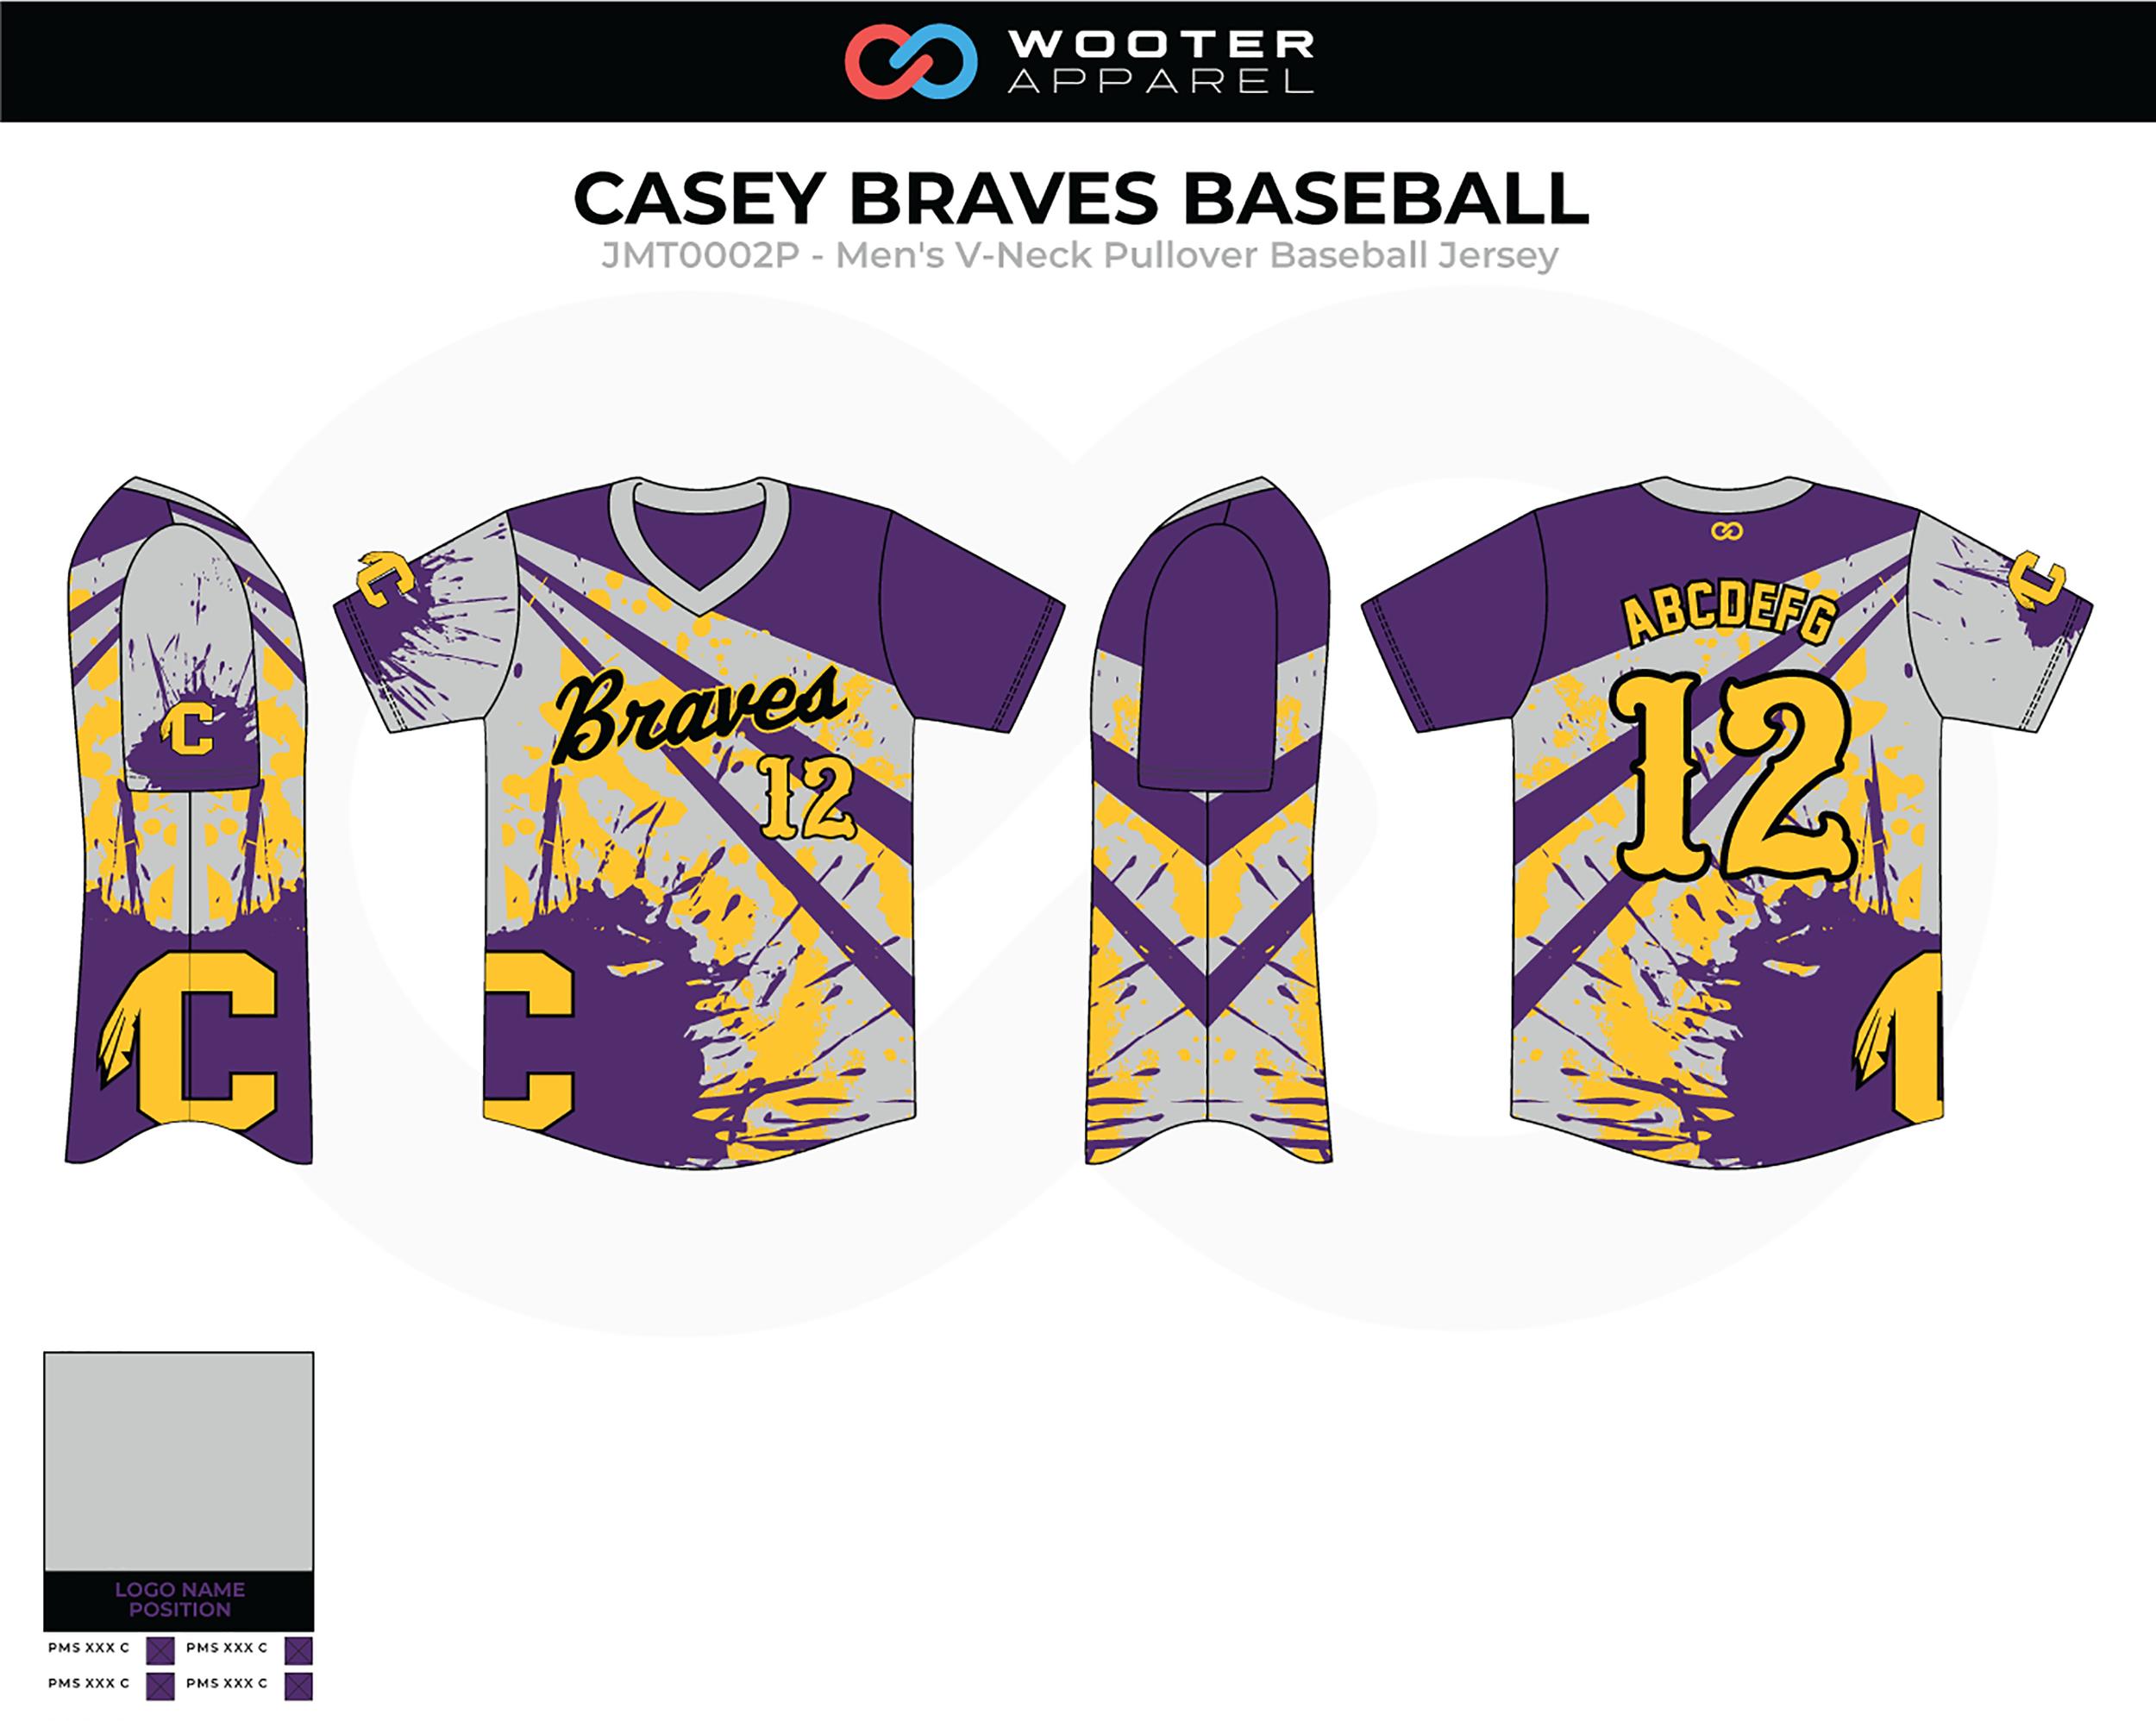 CaseyBravesBaseball_JerseyMockupV3.png